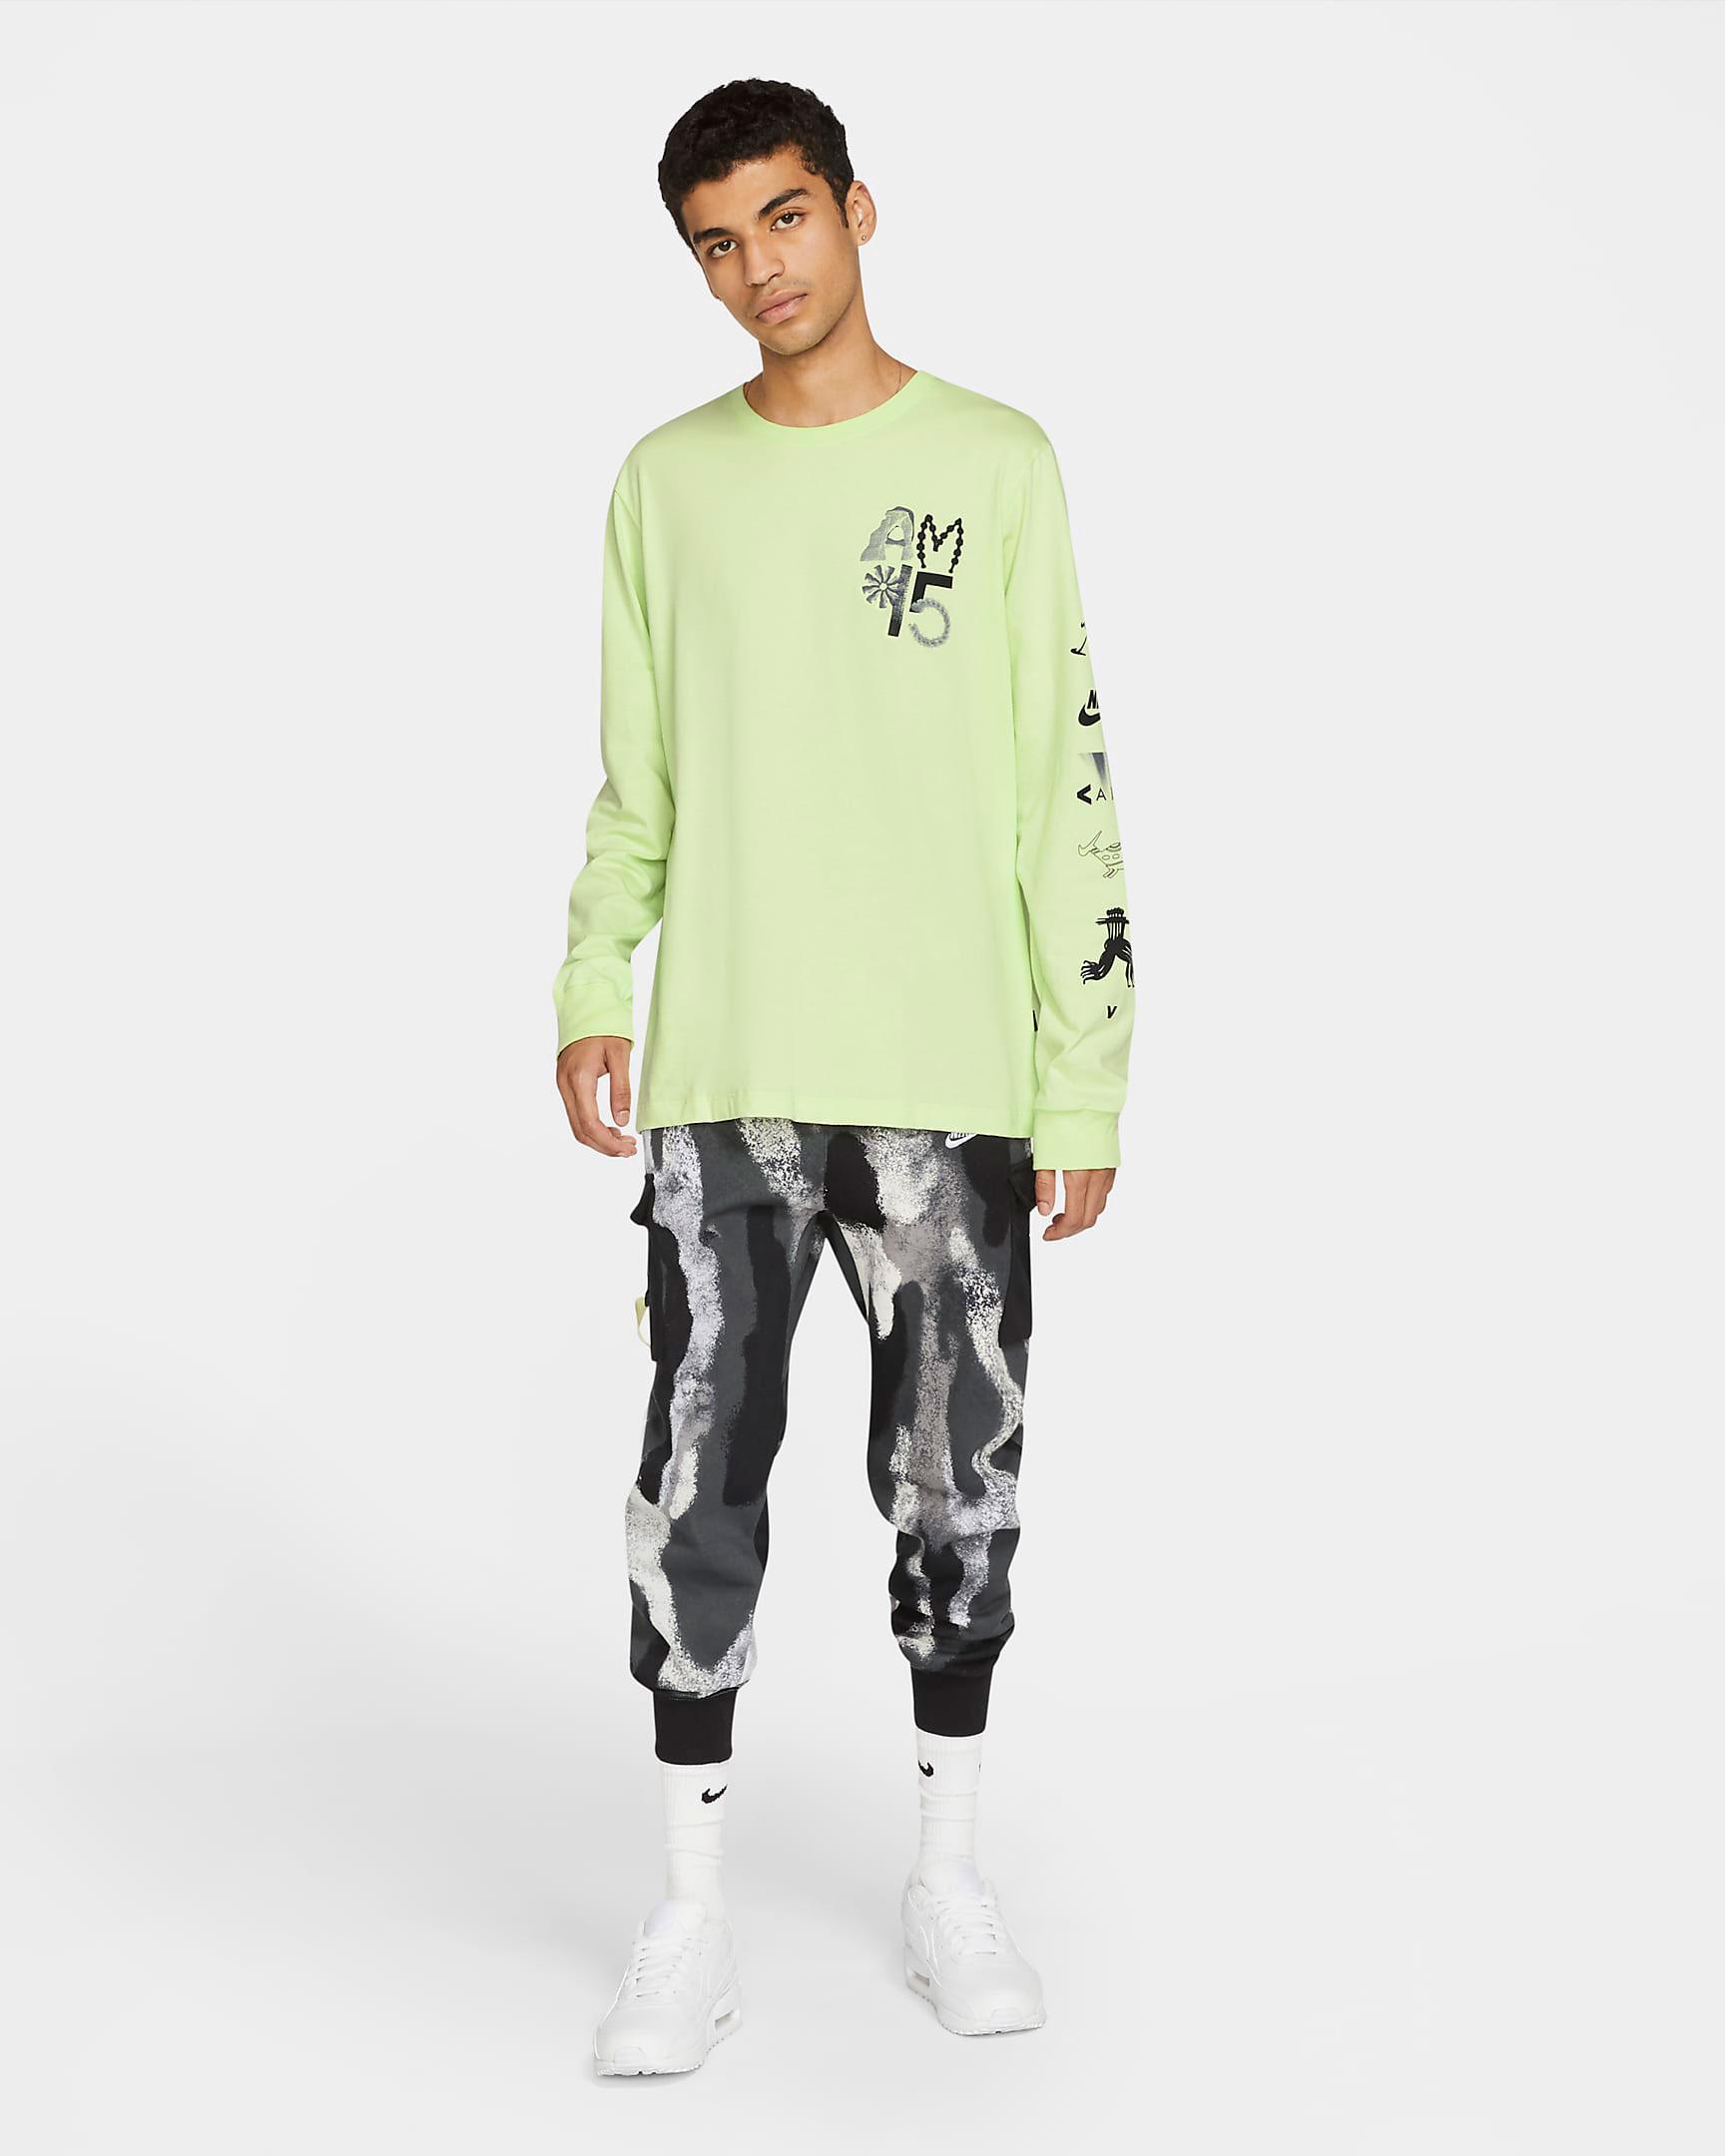 nike-air-max-95-og-neon-shirt-pants-outfit